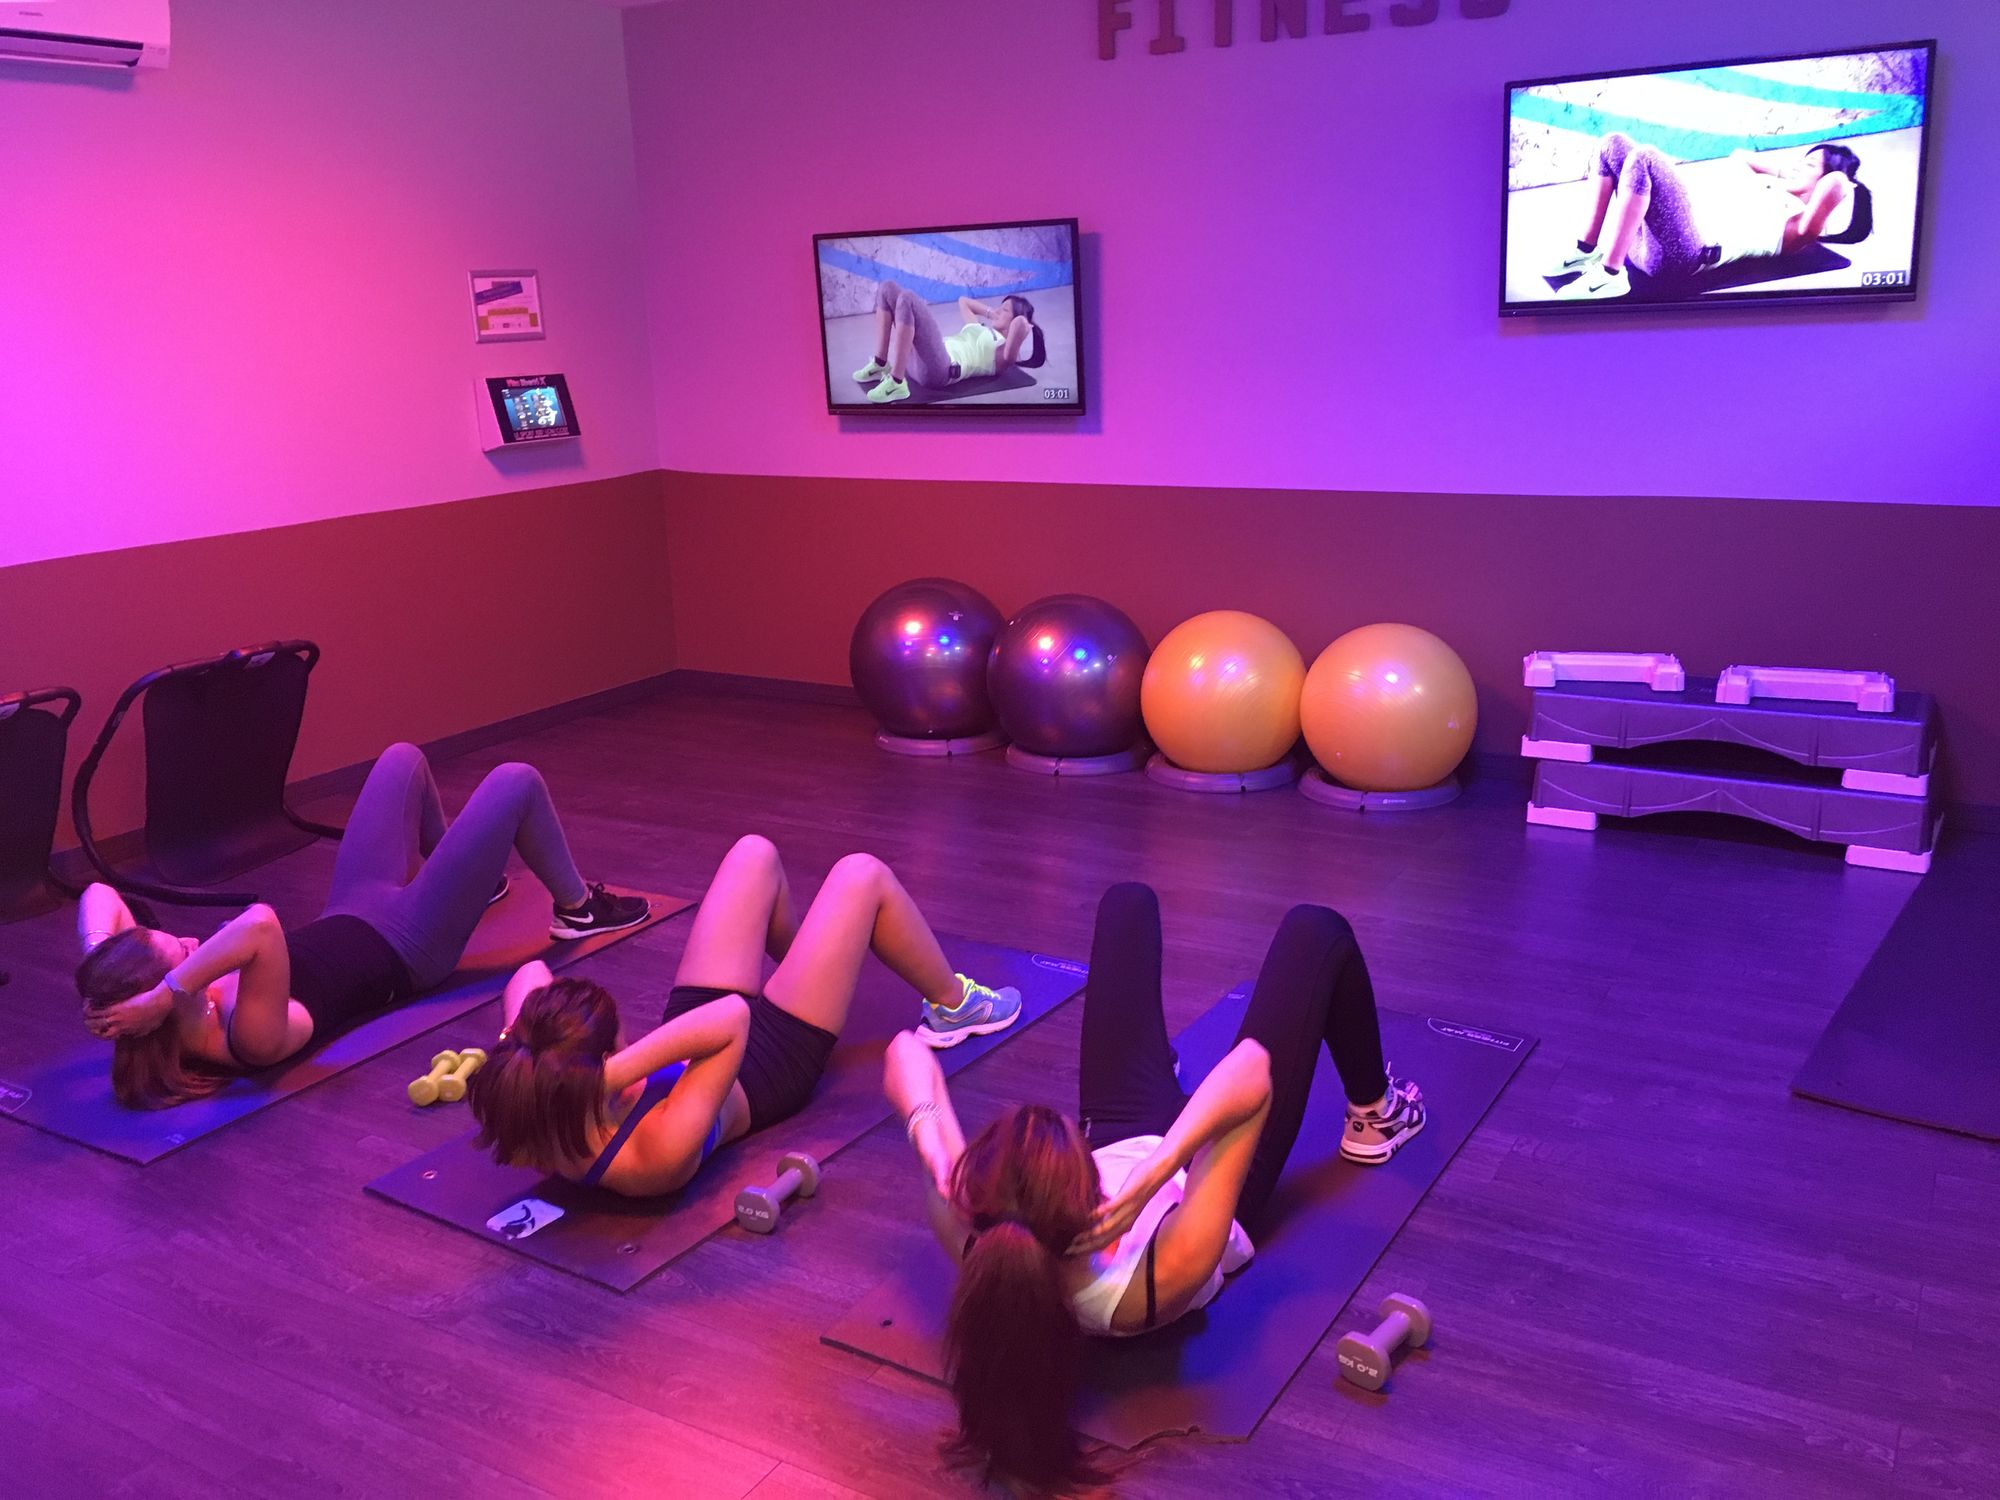 Salle de sport VIta liberté Fos sur mer Espace fitness